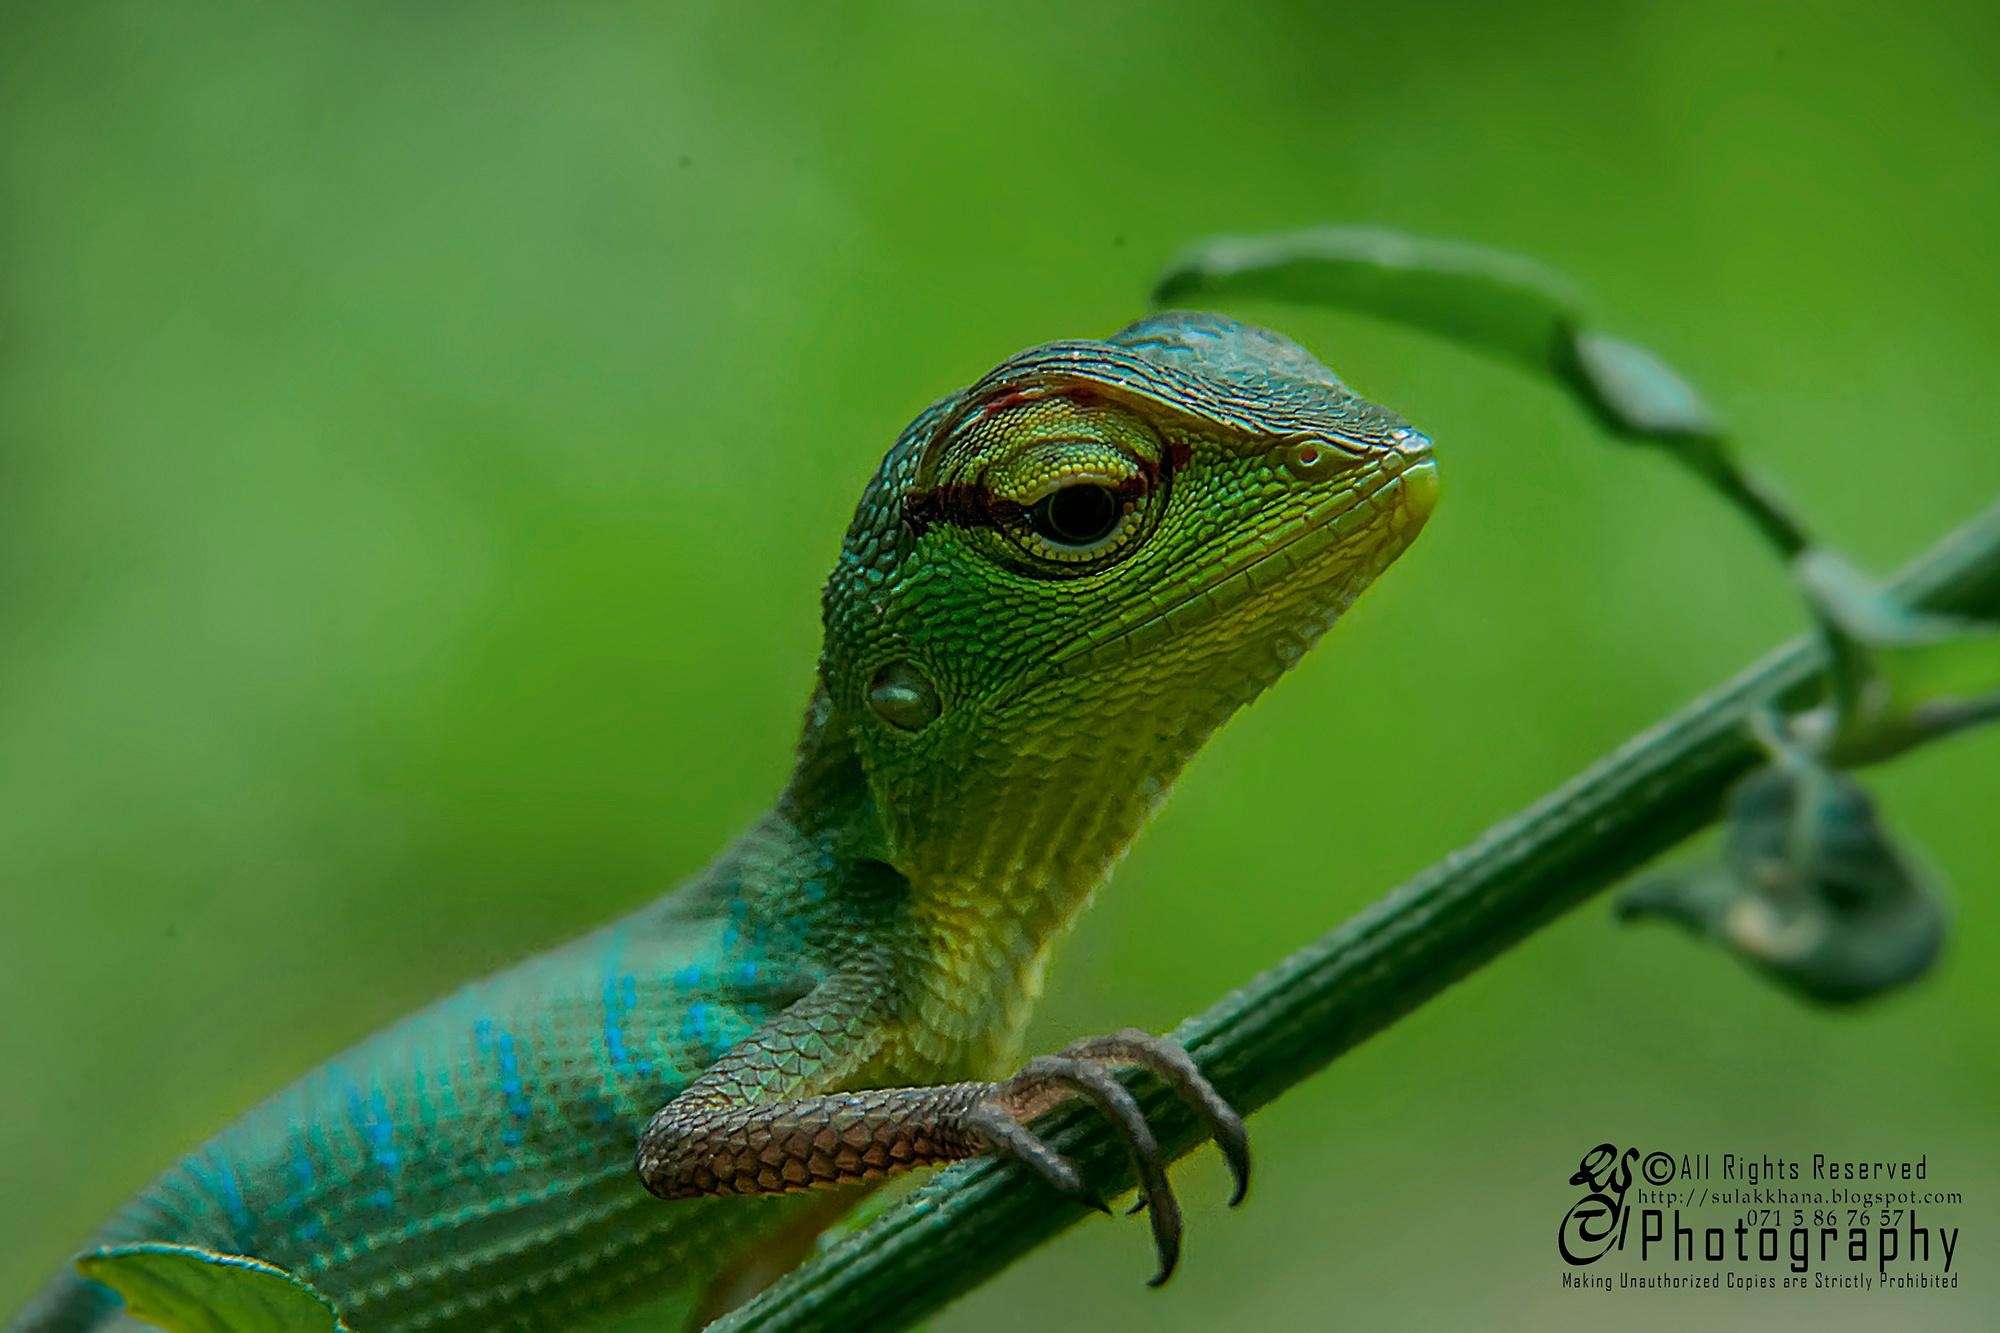 Common Green Forest Lizard  (Calotes calotes) by Sulakkhana Chamara